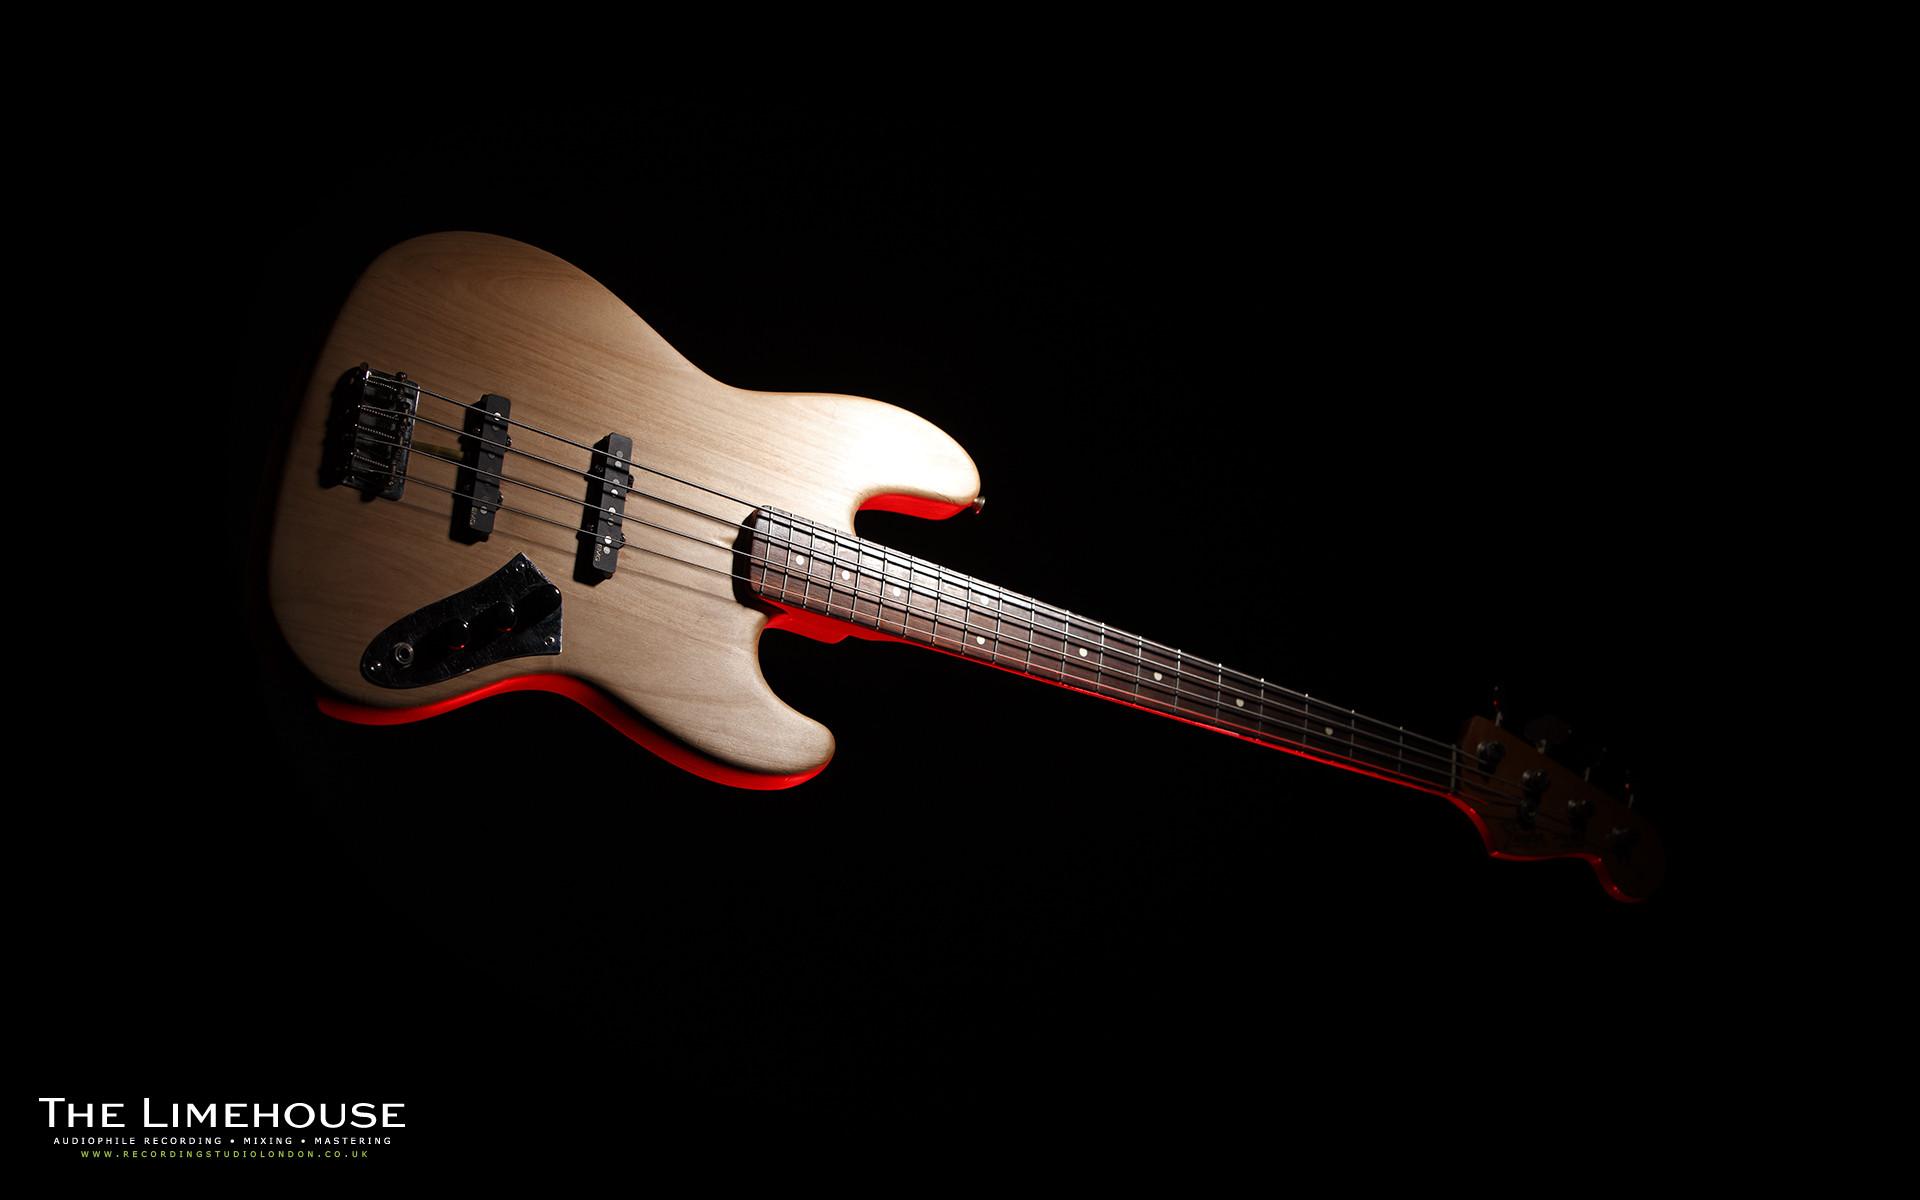 Bass Guitars Wallpaper Bass, Guitars, Bass, Guitars